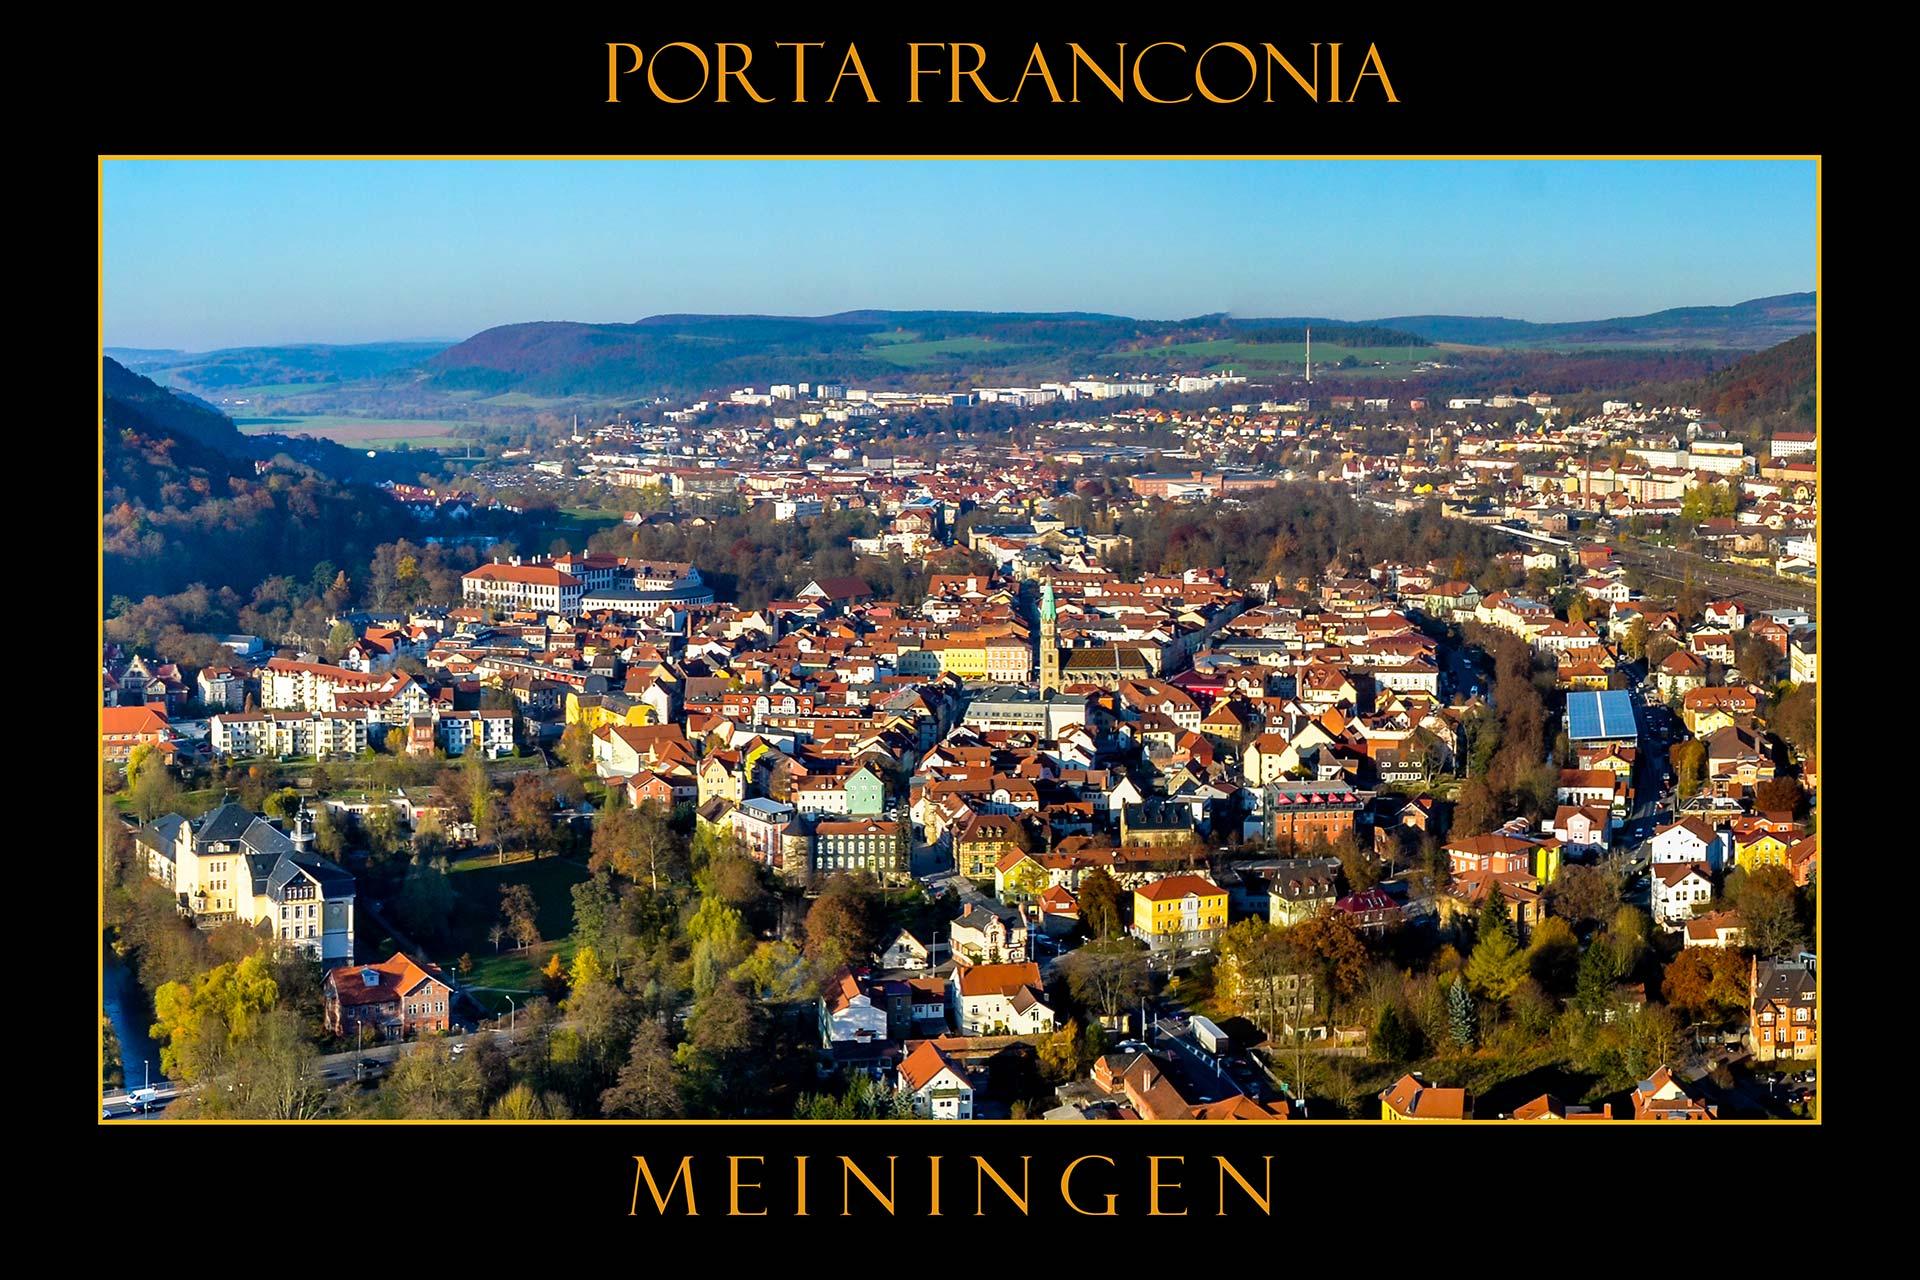 Postkarten - Meiningen, Porta Franconia